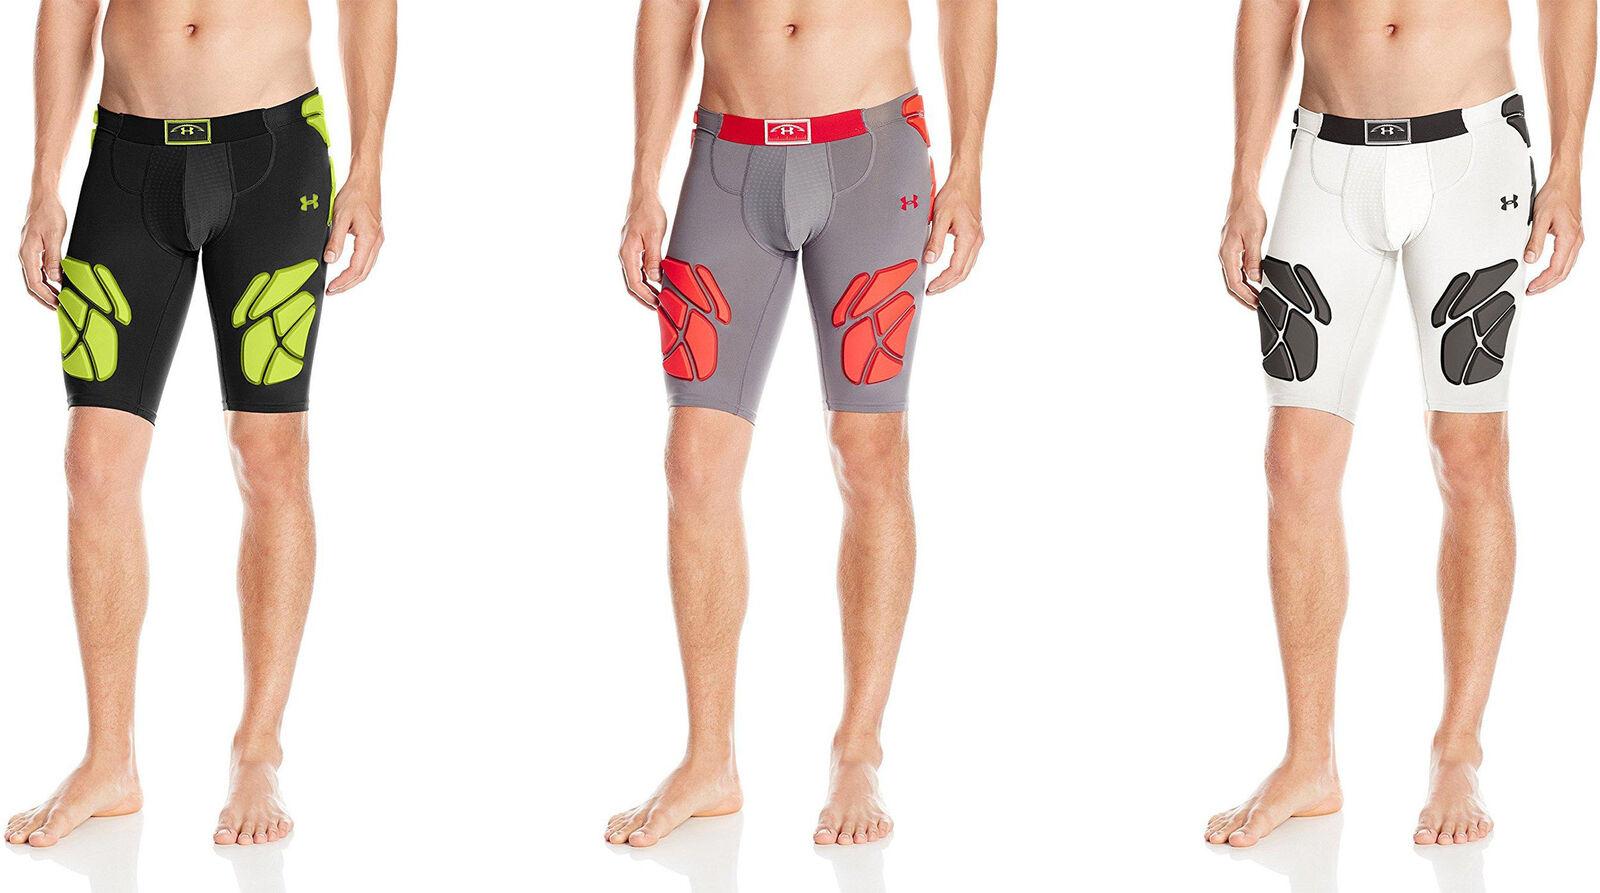 NWT Men/'s Under Armour Medium Football Gameday Armour Girdle Compression Shorts